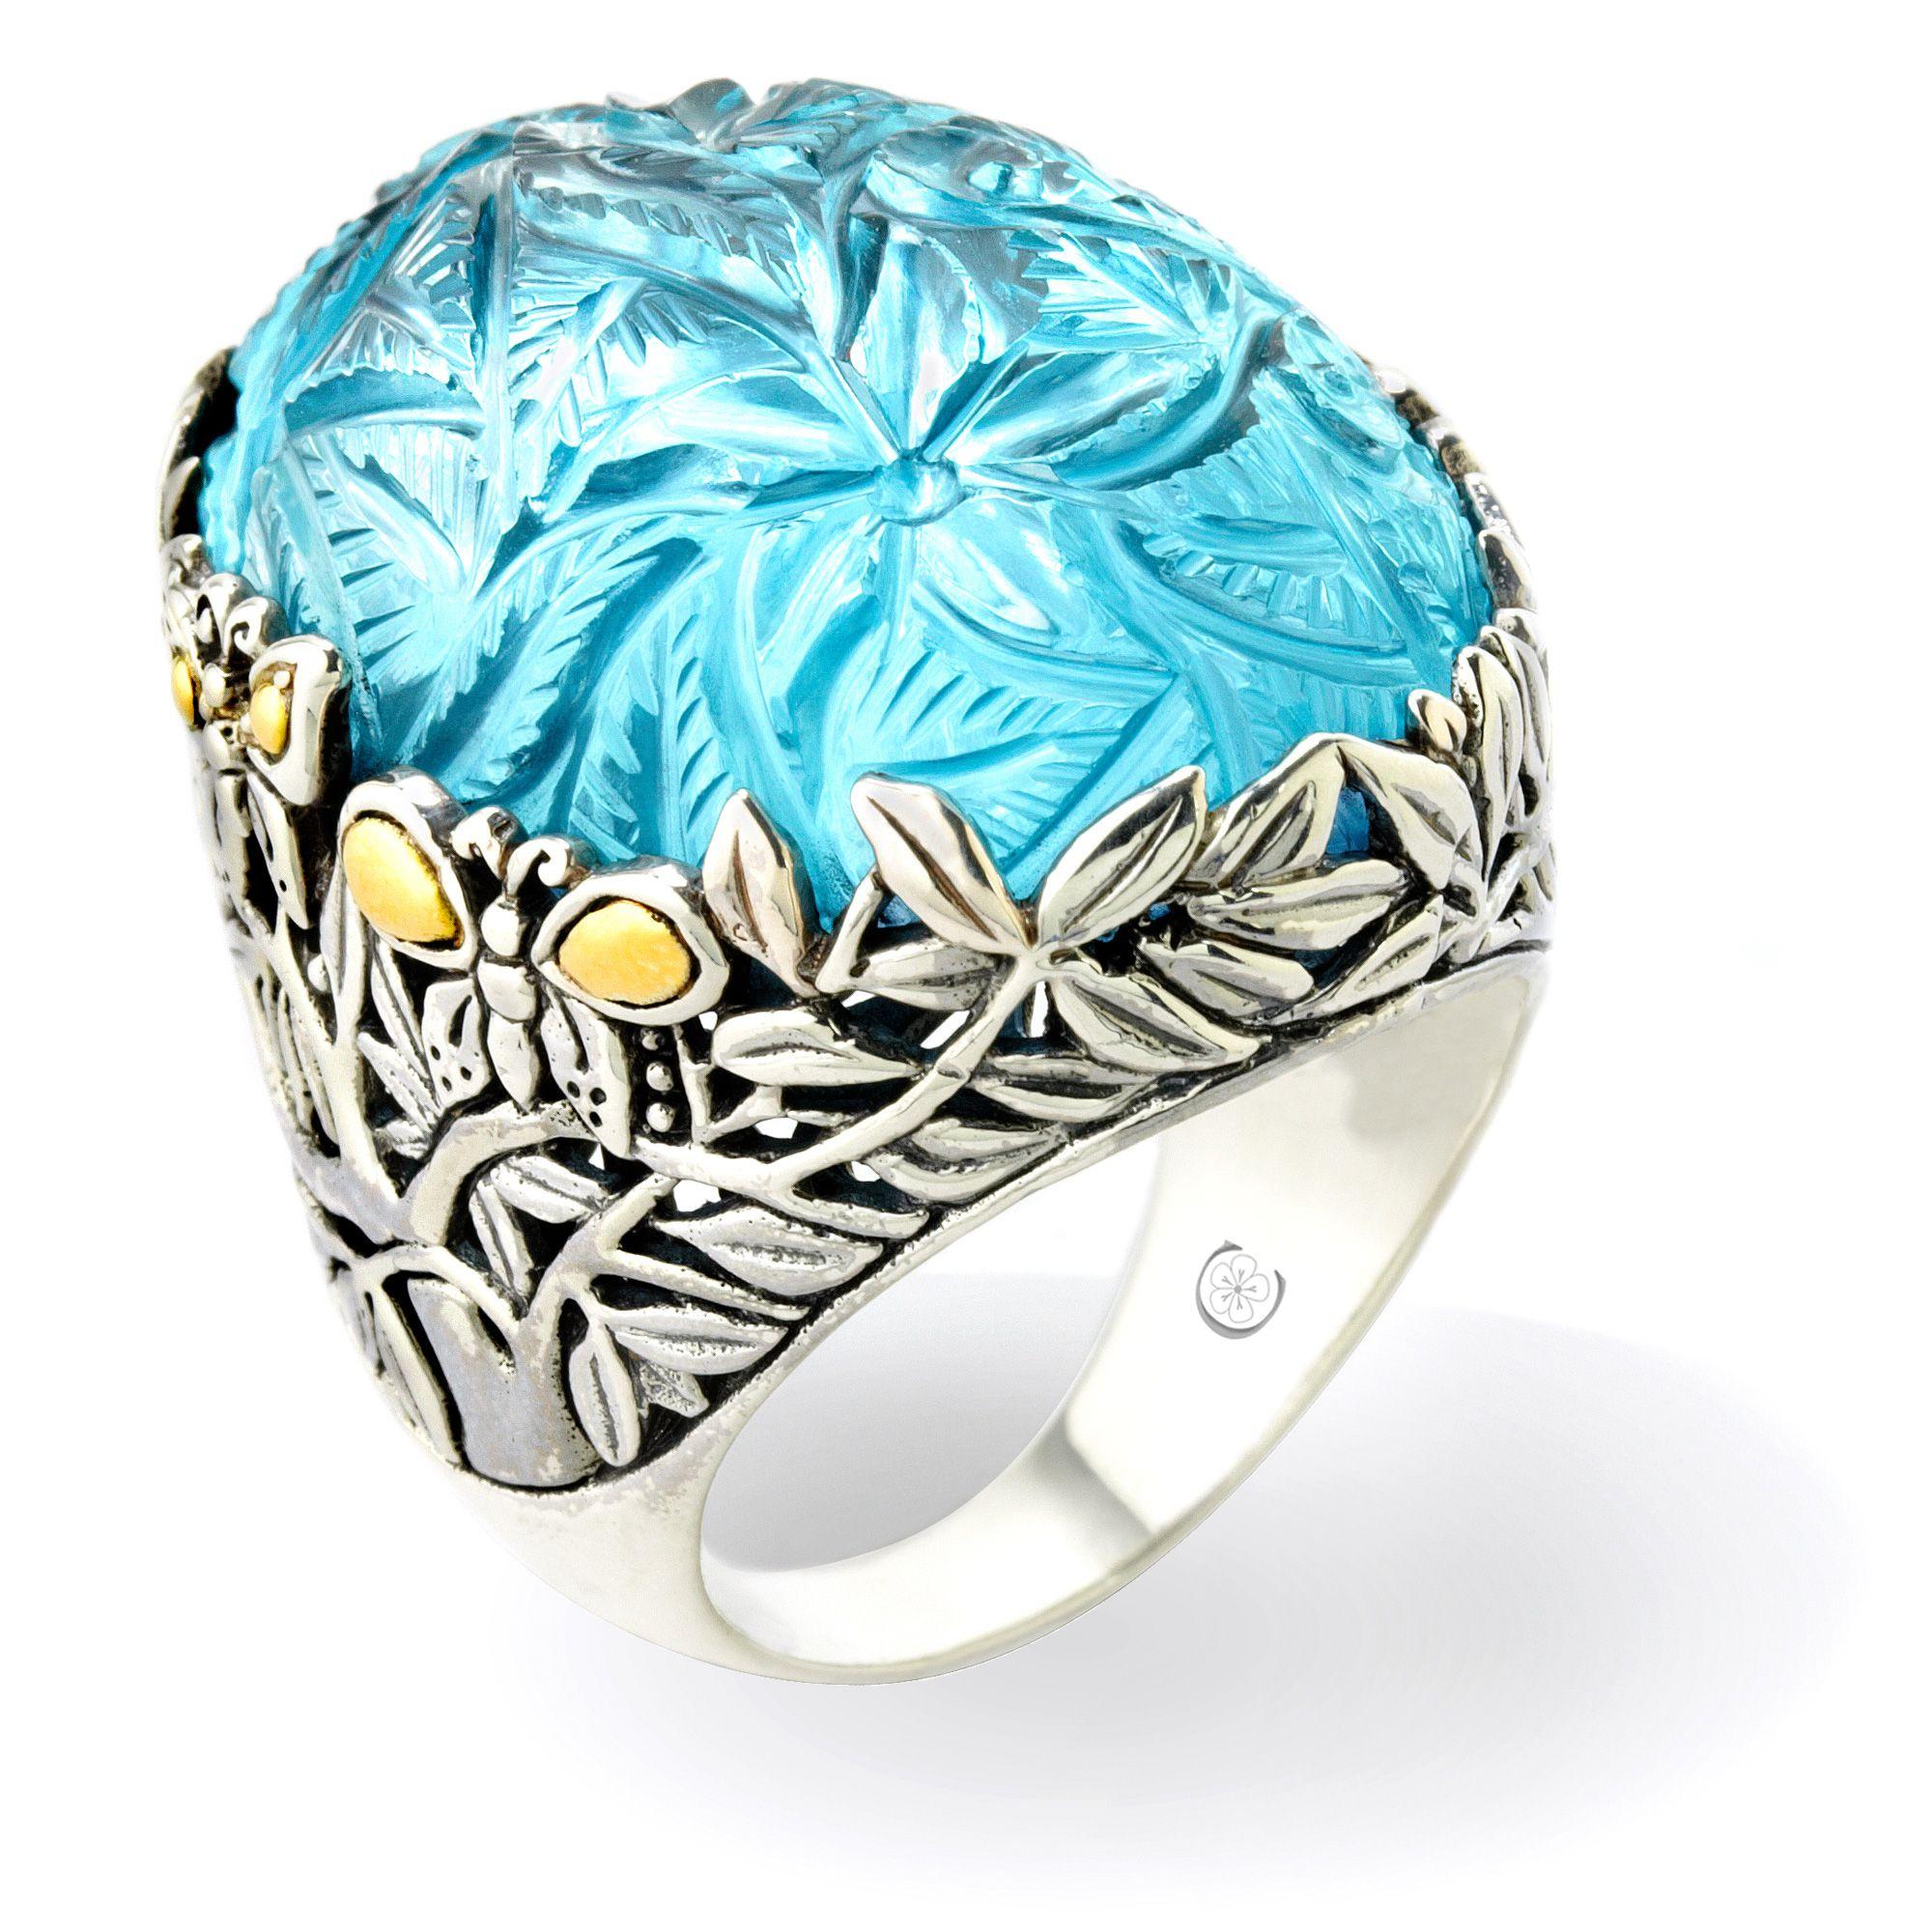 Sterling Silver and 18k Gold Hand Carved Gemstones.  R1773.SG8BT  $698